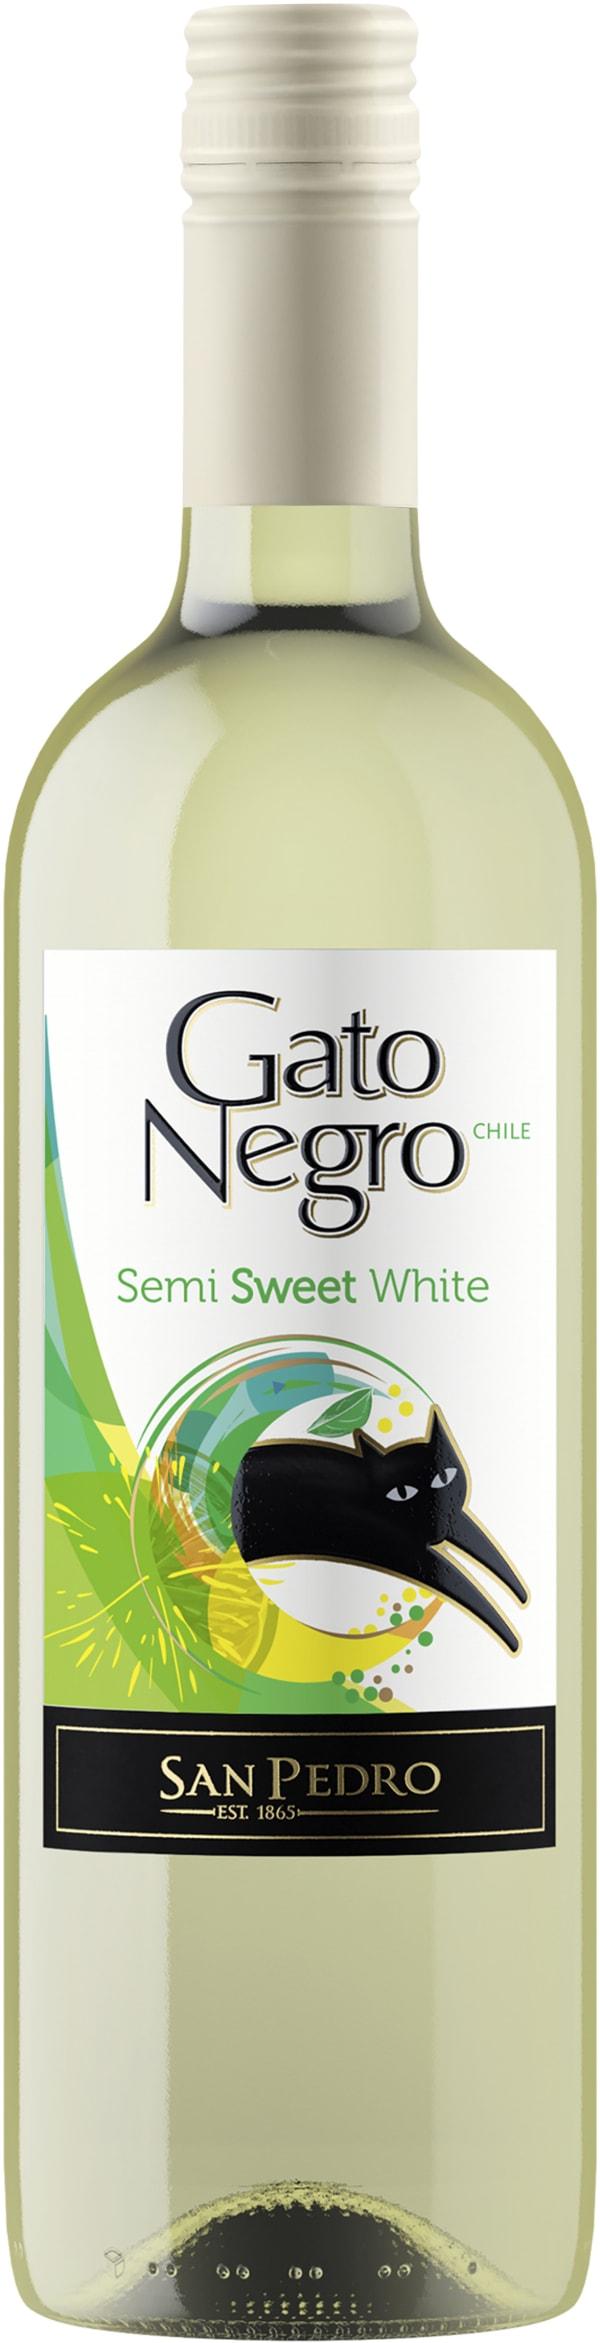 Gato Negro Semi Sweet White 0